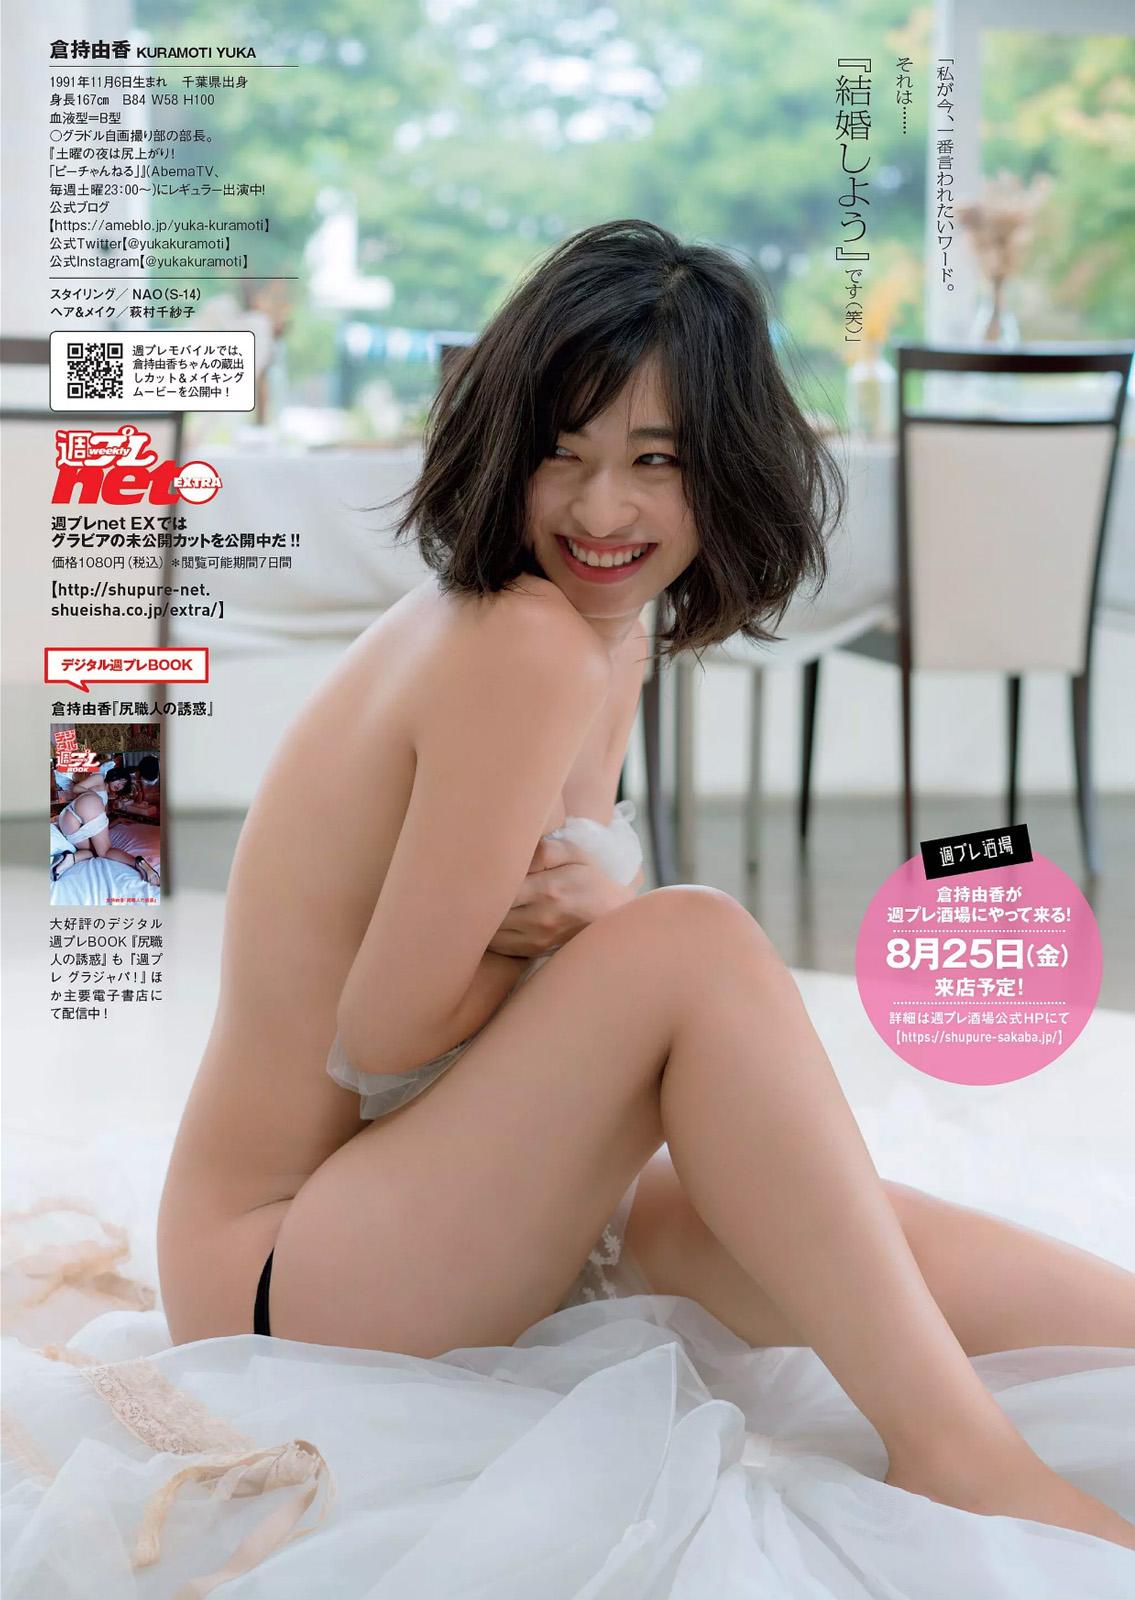 Yuka Kuramoti 倉持由香, Weekly Playboy 2017 No.36 (週刊プレイボーイ 2017年36号)